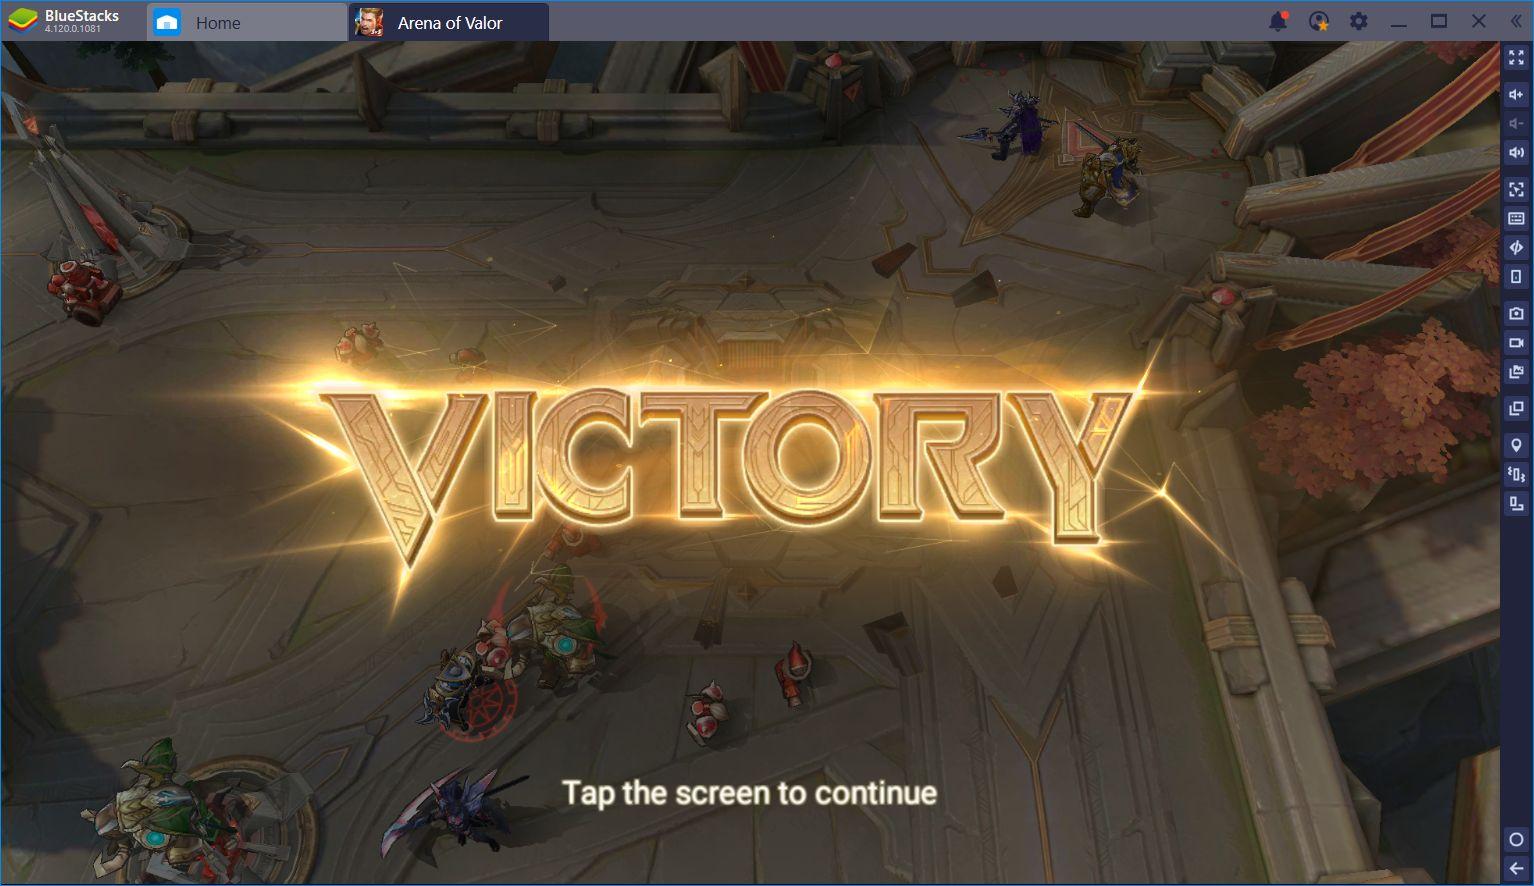 Arena of Valor: Intense Mobile MOBA Fun on BlueStacks